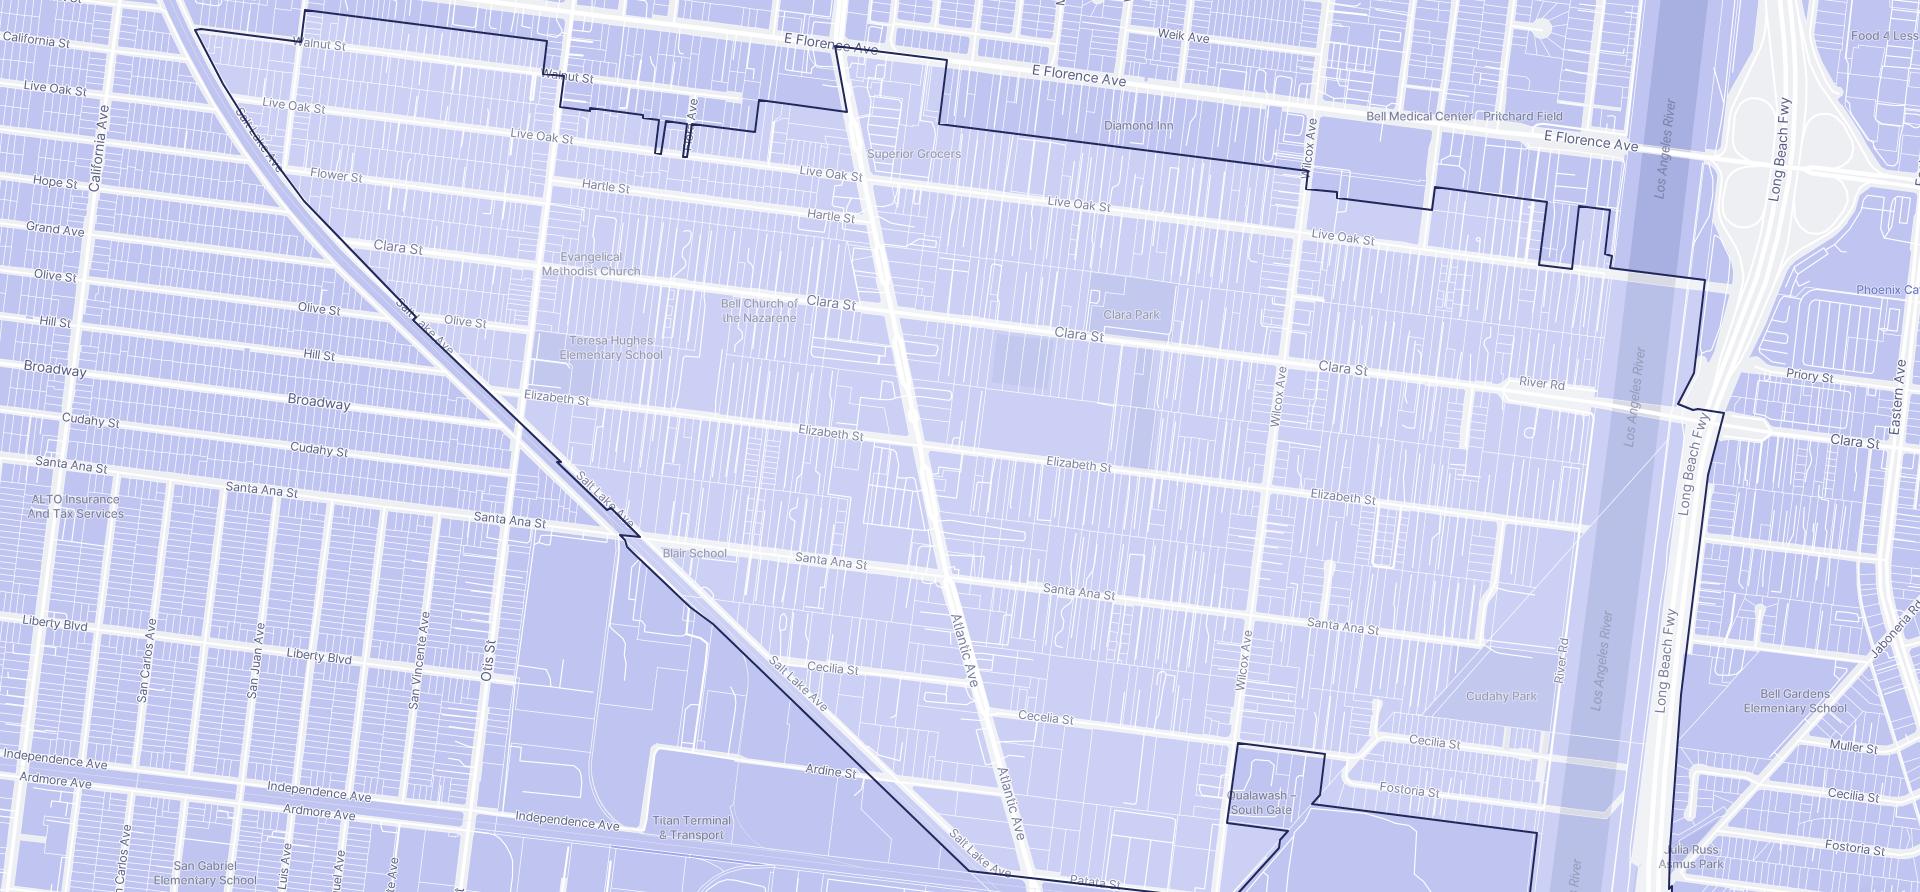 Image of Cudahy boundaries on a map.